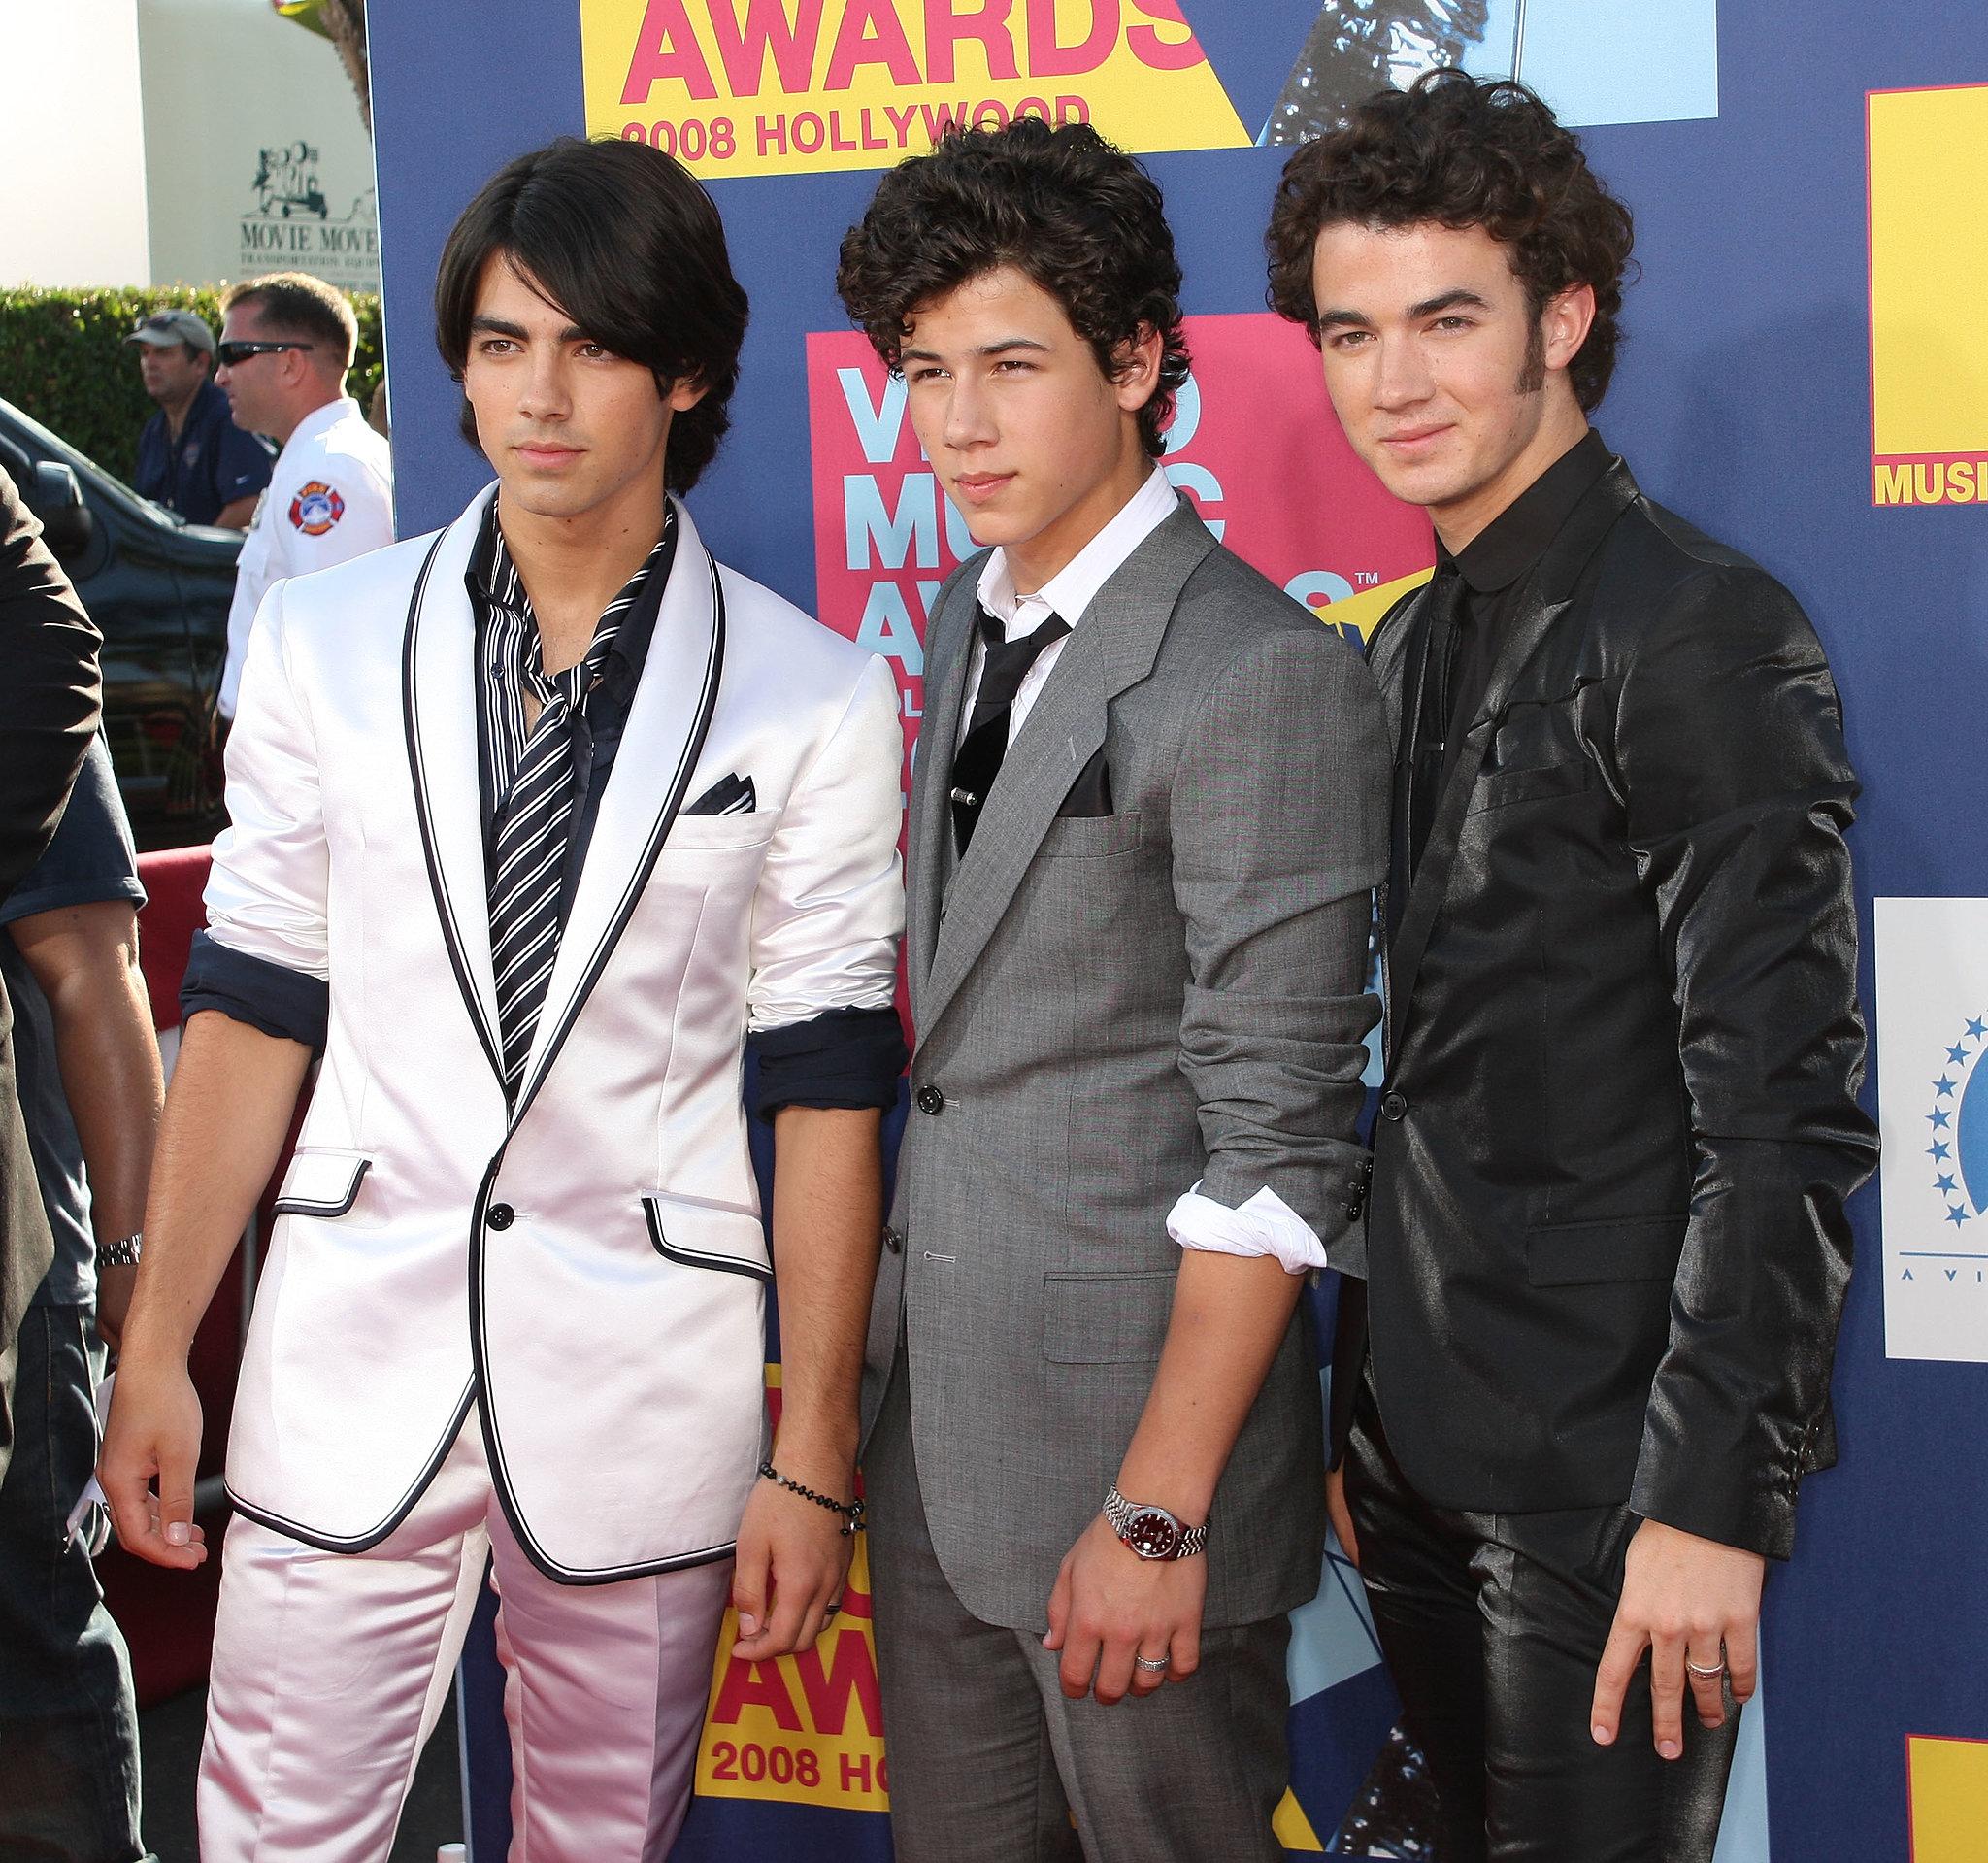 The Jonas Brothers, 2008